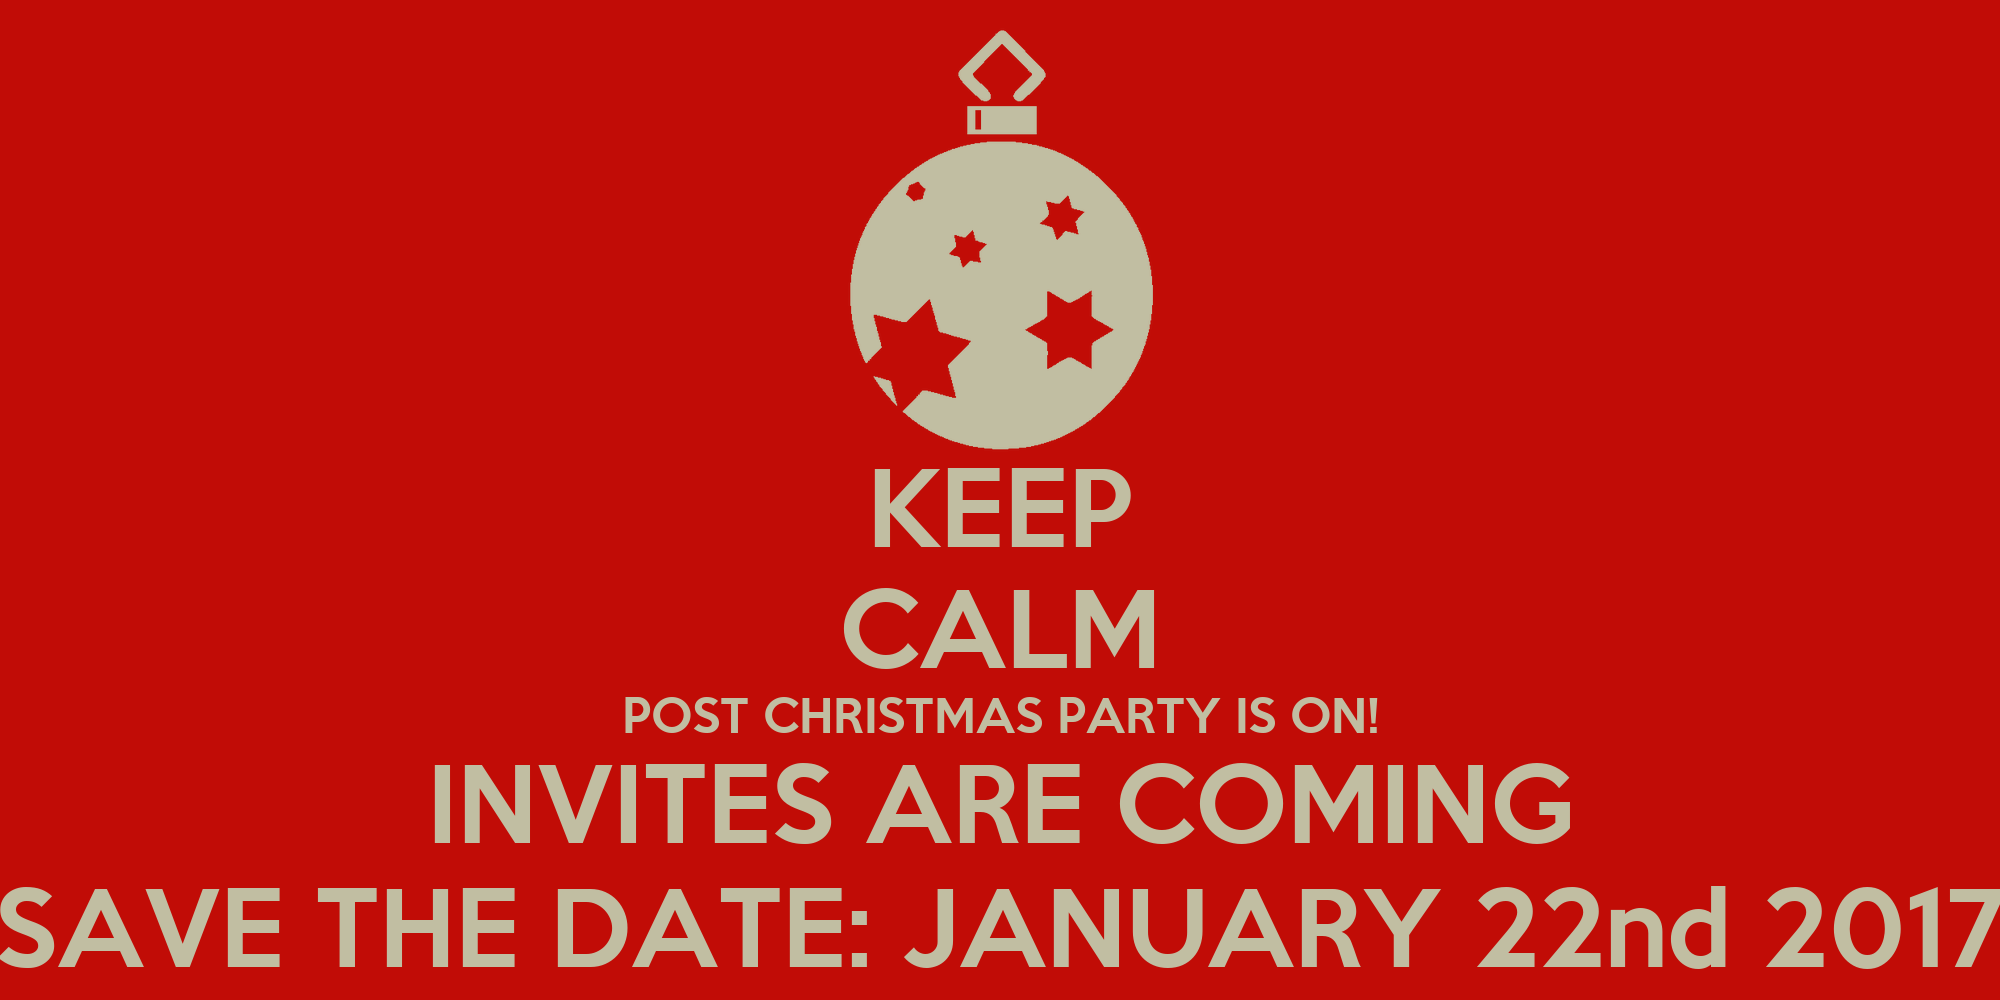 Teddy Bear Invites was adorable invitation template